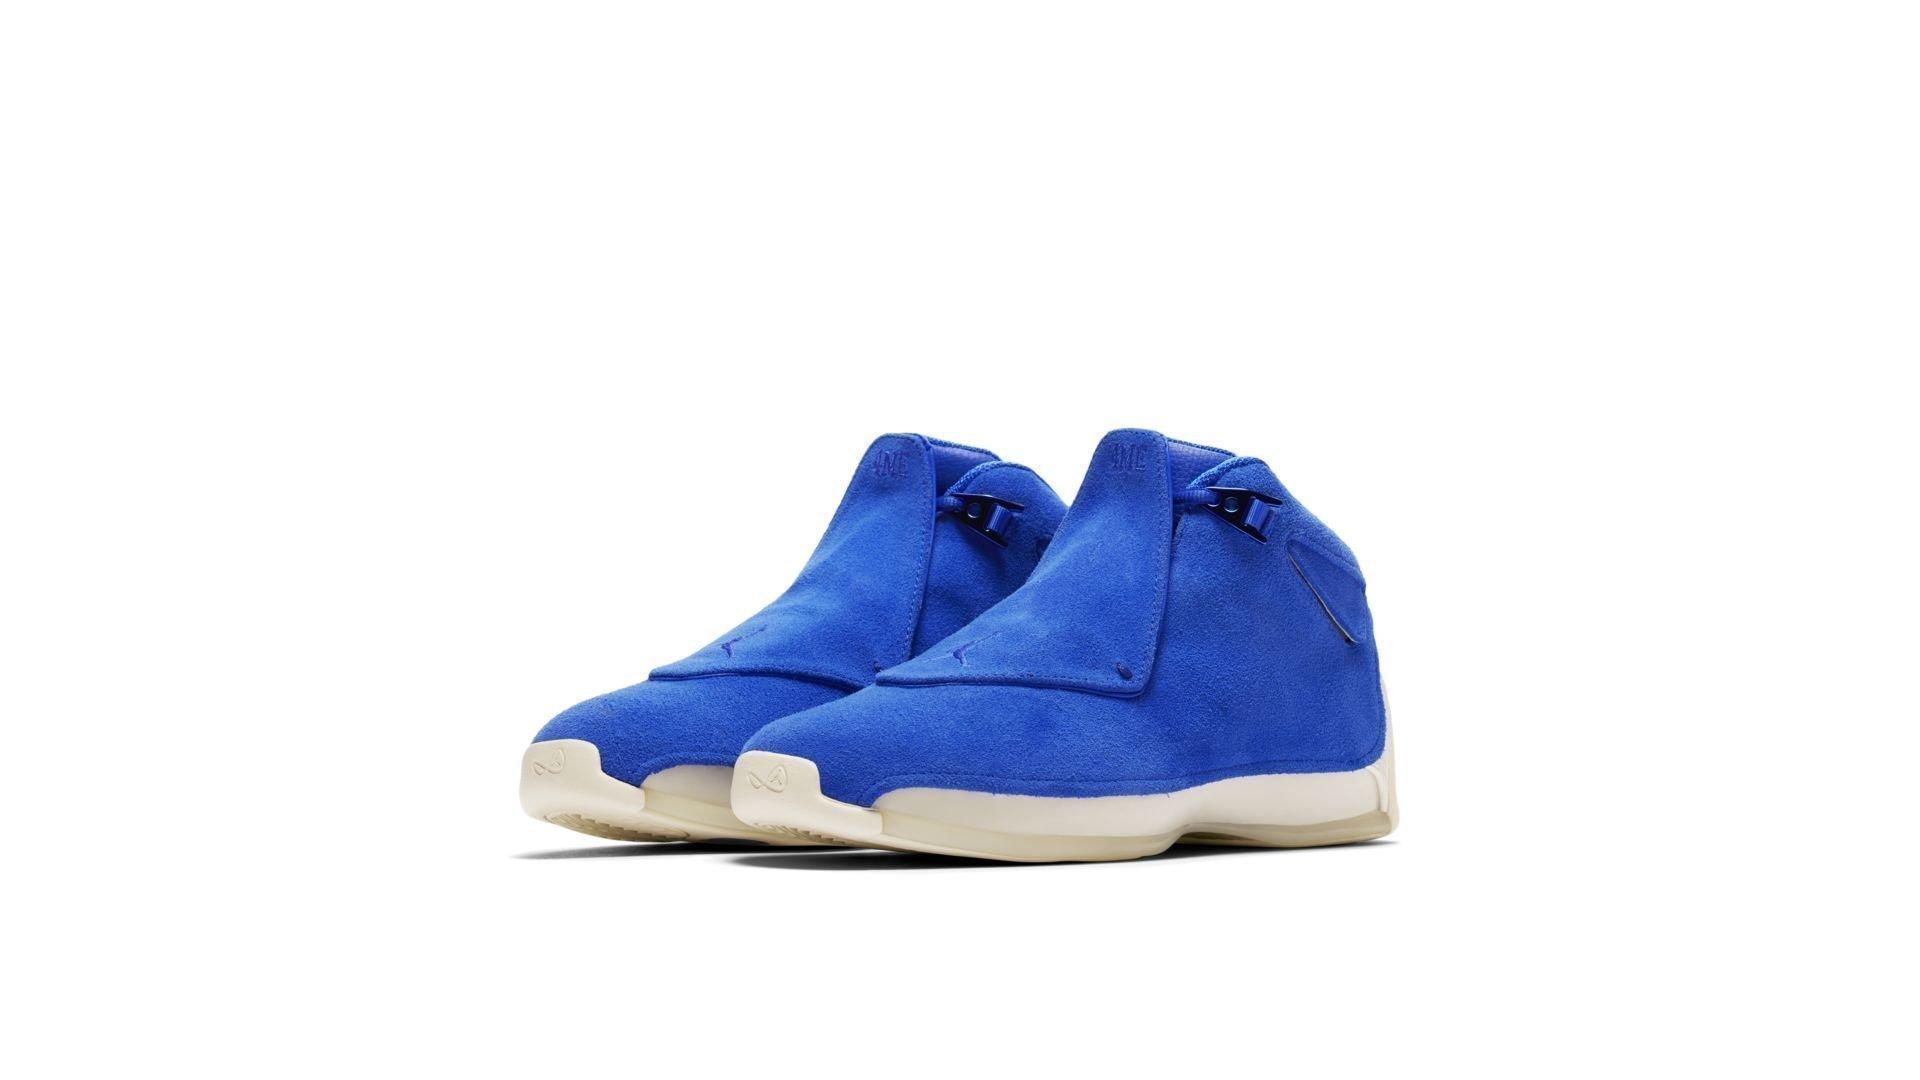 Jordan 18 Retro Racer Blue (AA2494-401)